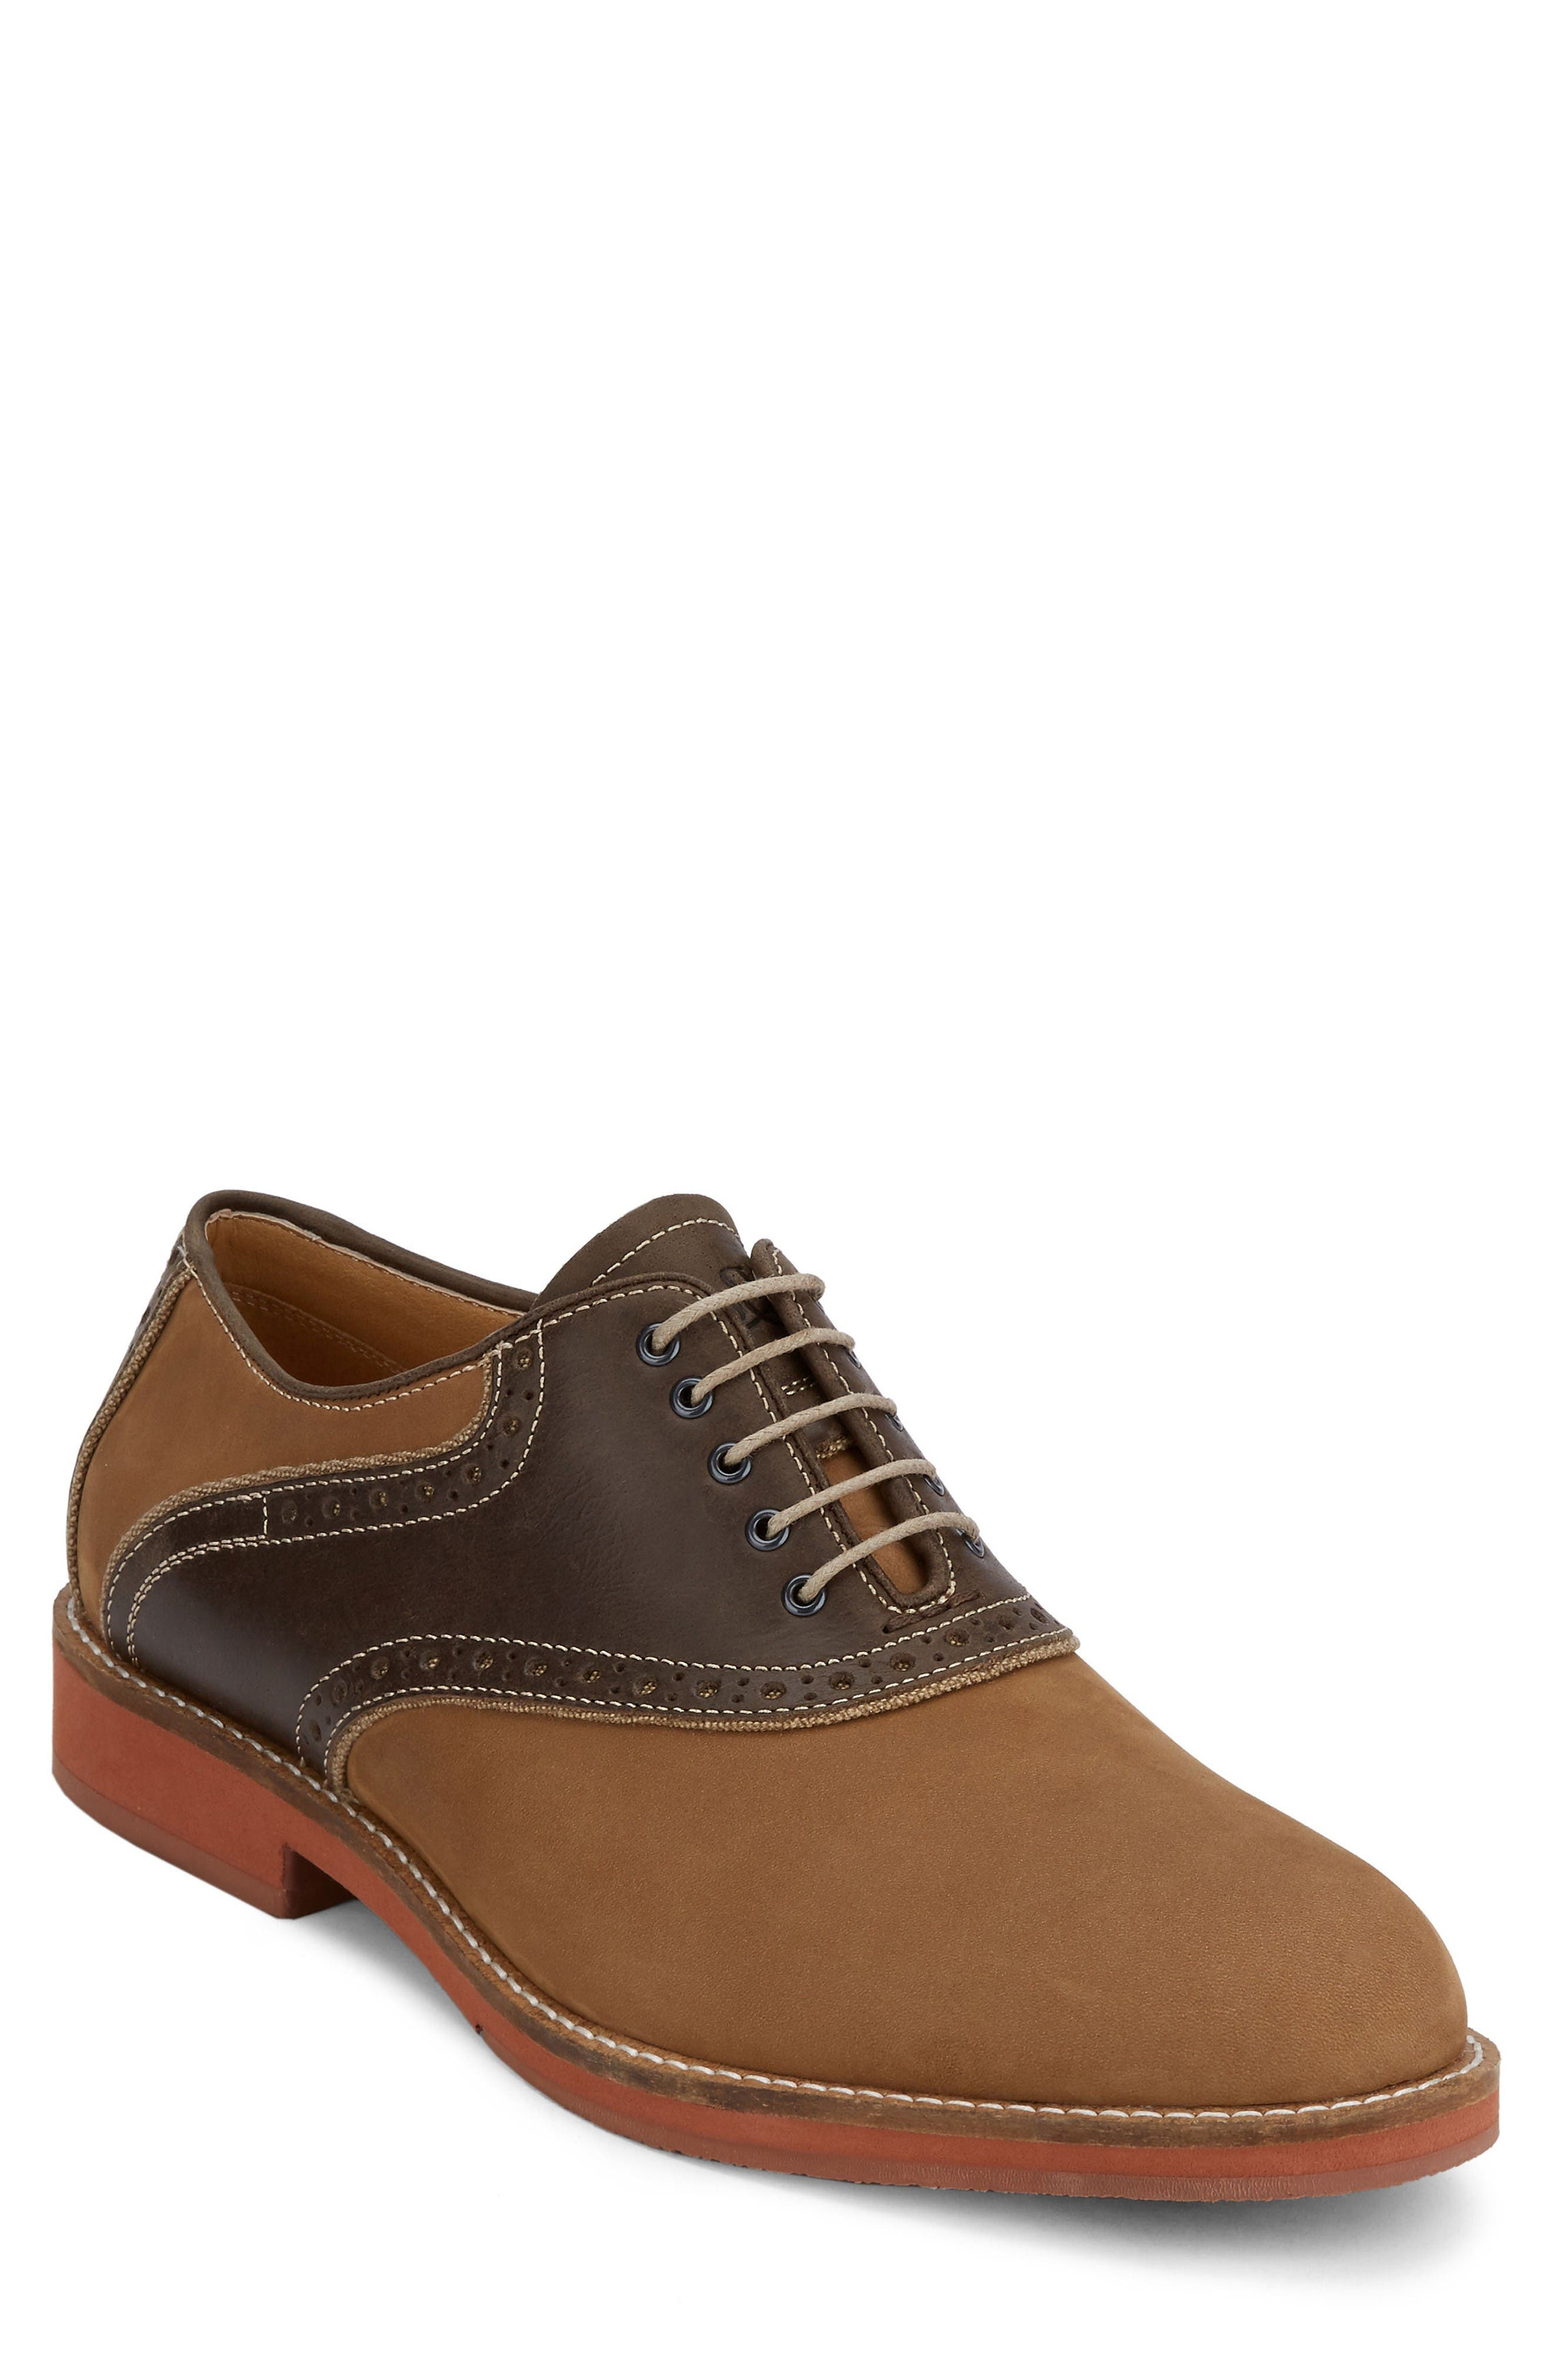 Main Image - G.H. Bass & Co. Noah Saddle Shoe (Men)